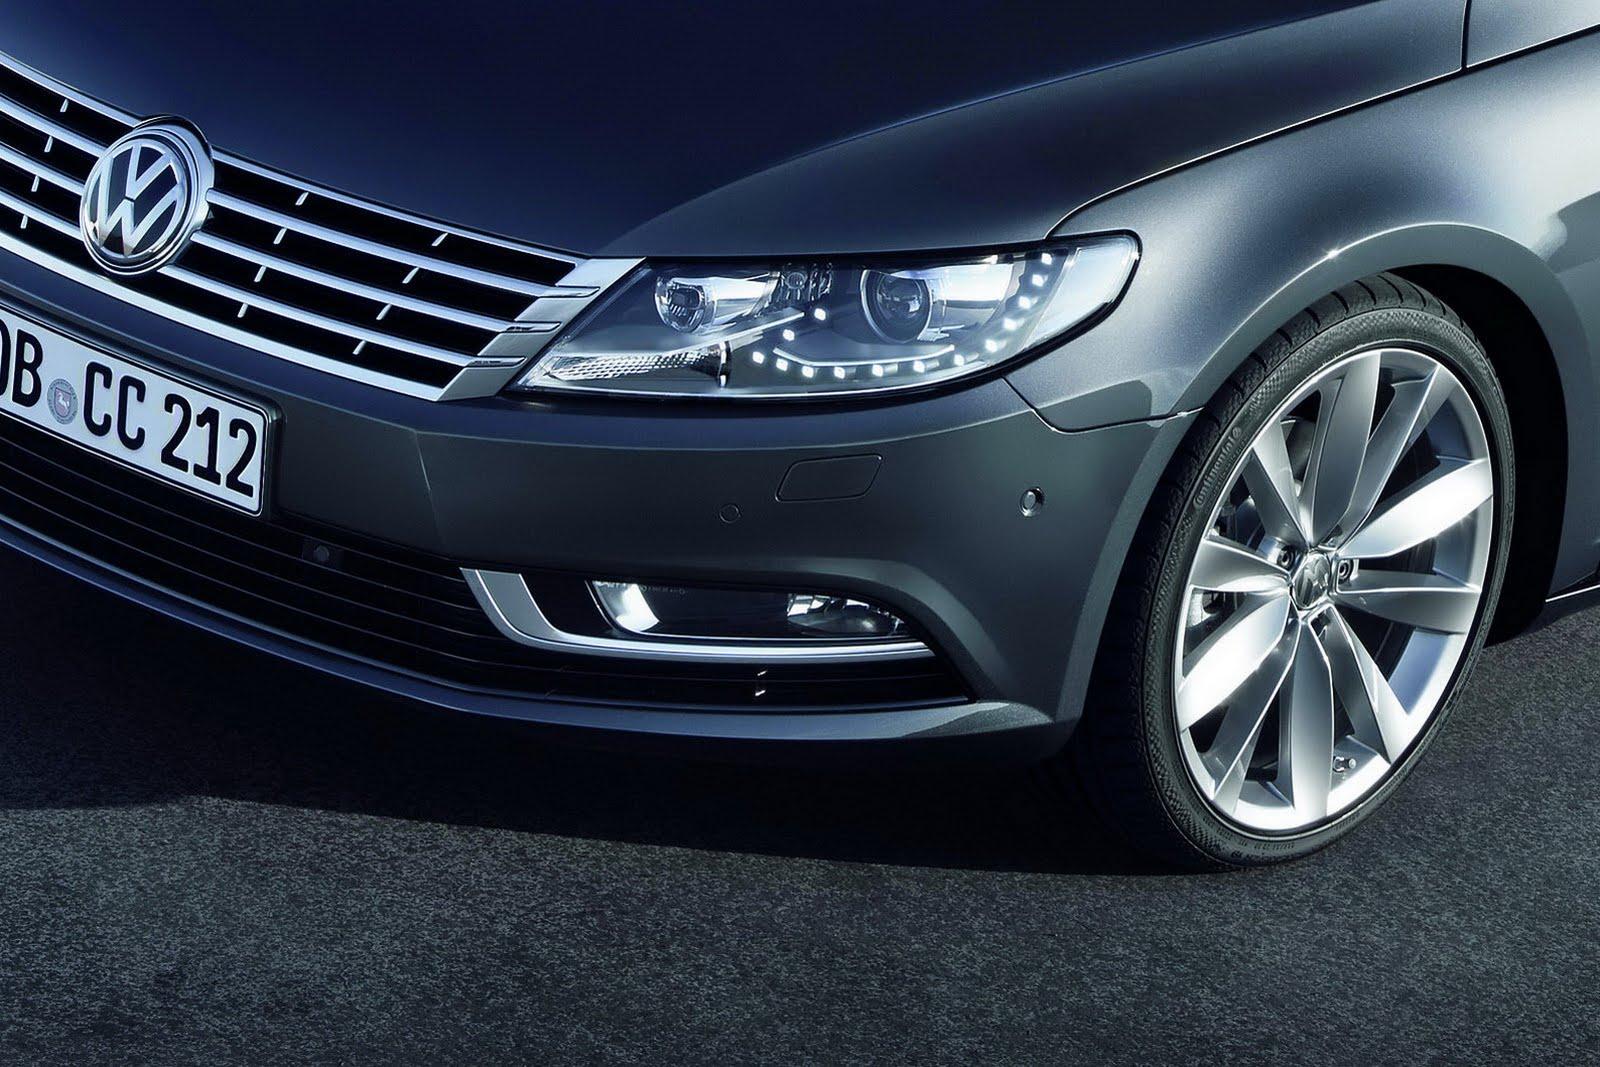 2013 Volkswagen CC Facelift redesign ahead 2011 LA Auto ...